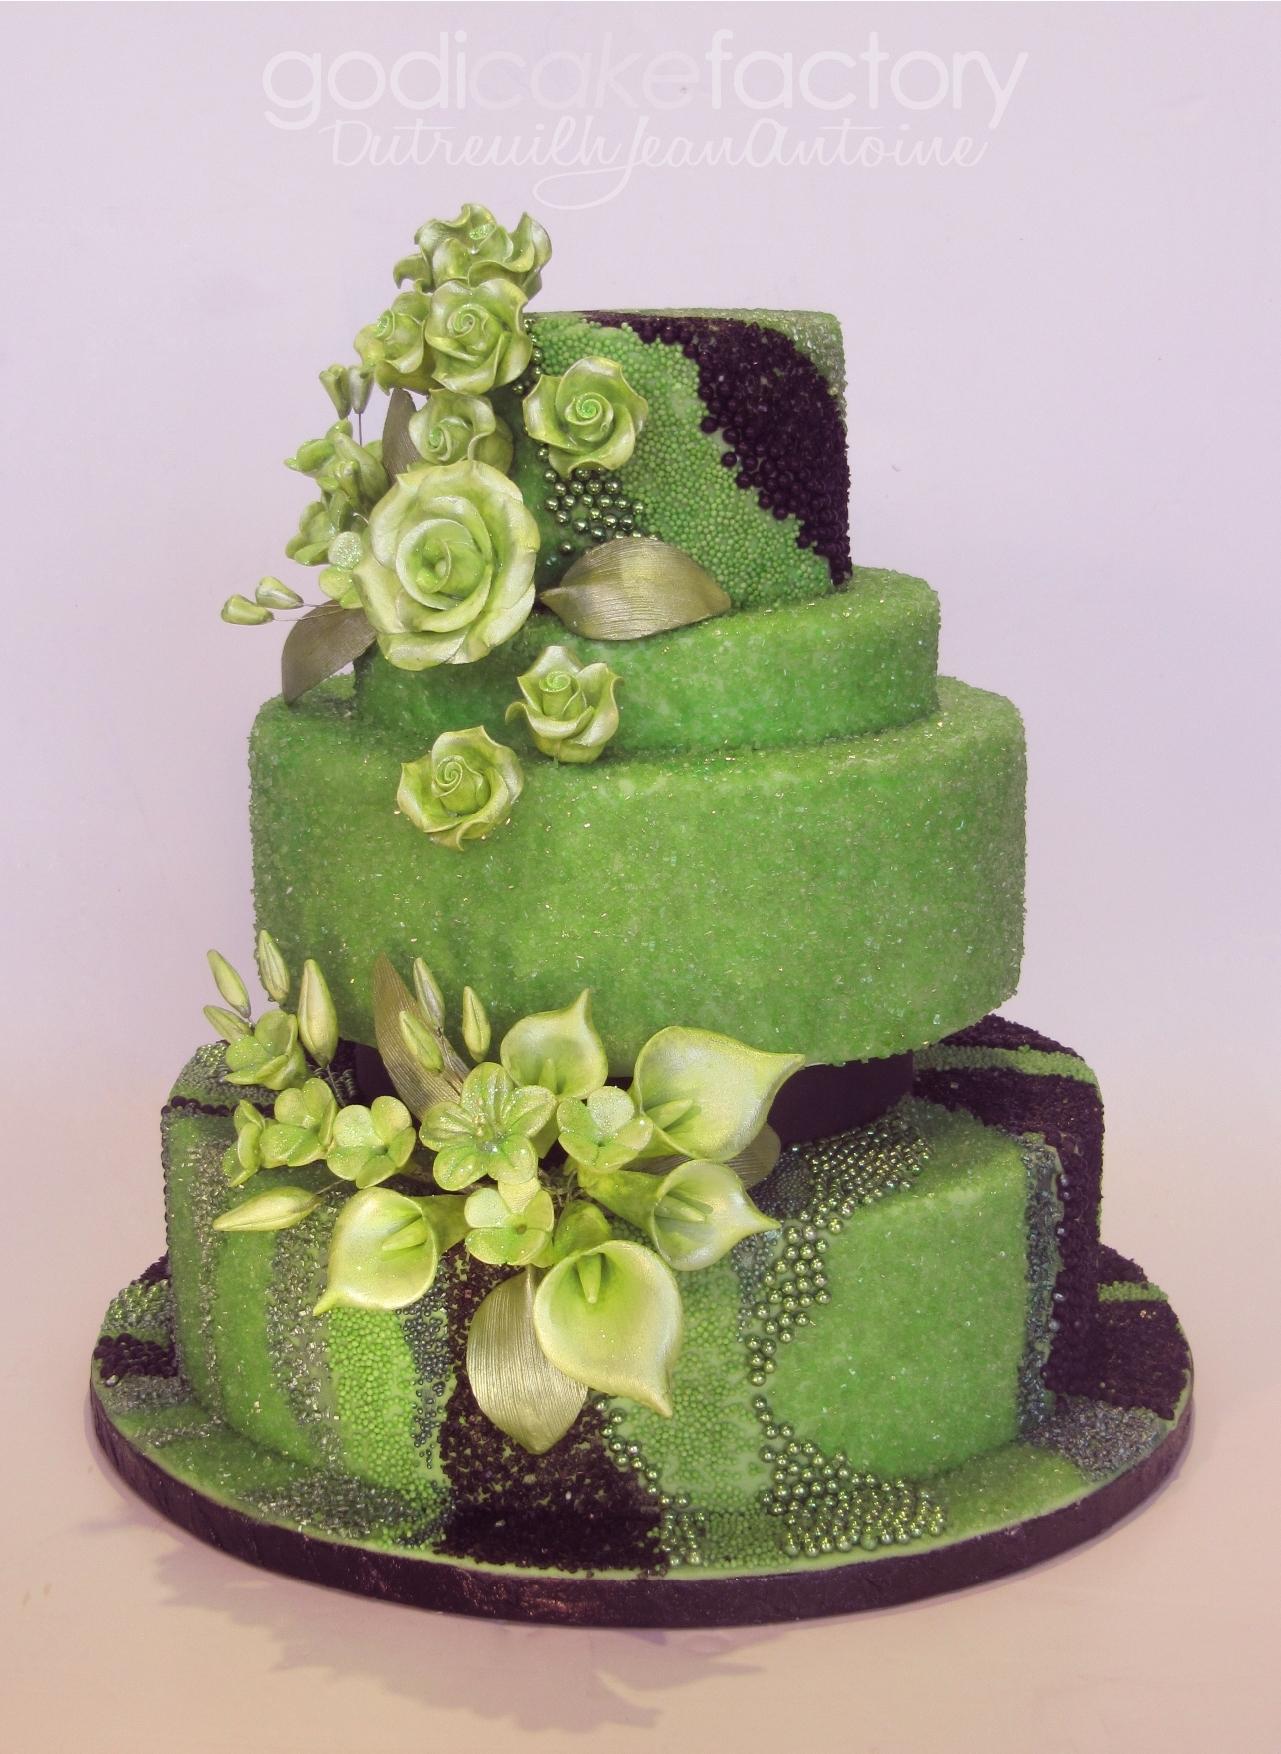 Jean-Antoine-Dutreuilh-Godicakefactory-Wedding-Elegant-1.jpg#asset:16138